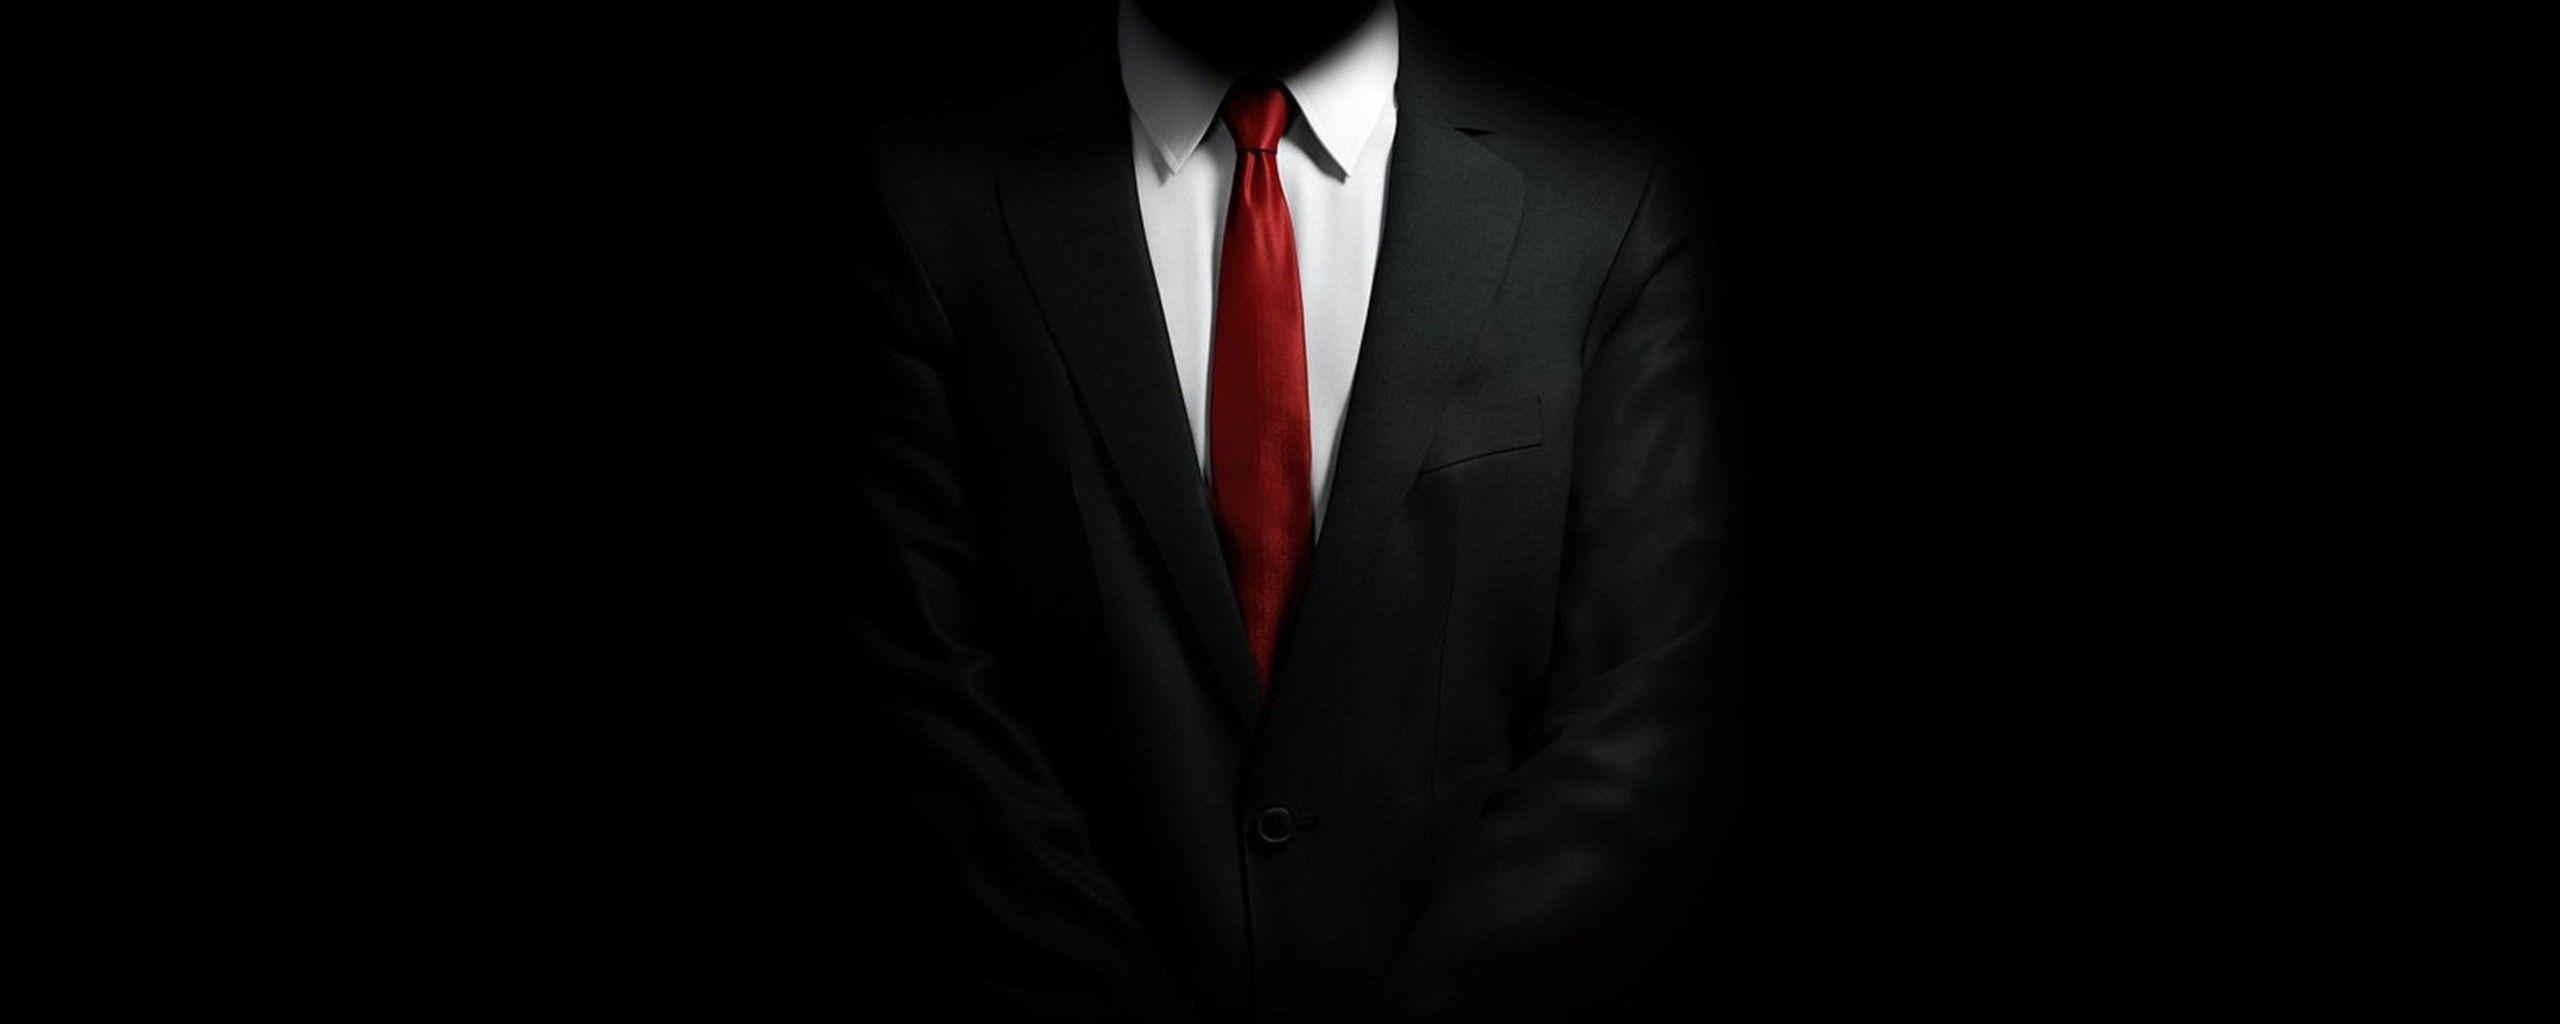 Hitman Suit Wallpapers Top Free Hitman Suit Backgrounds